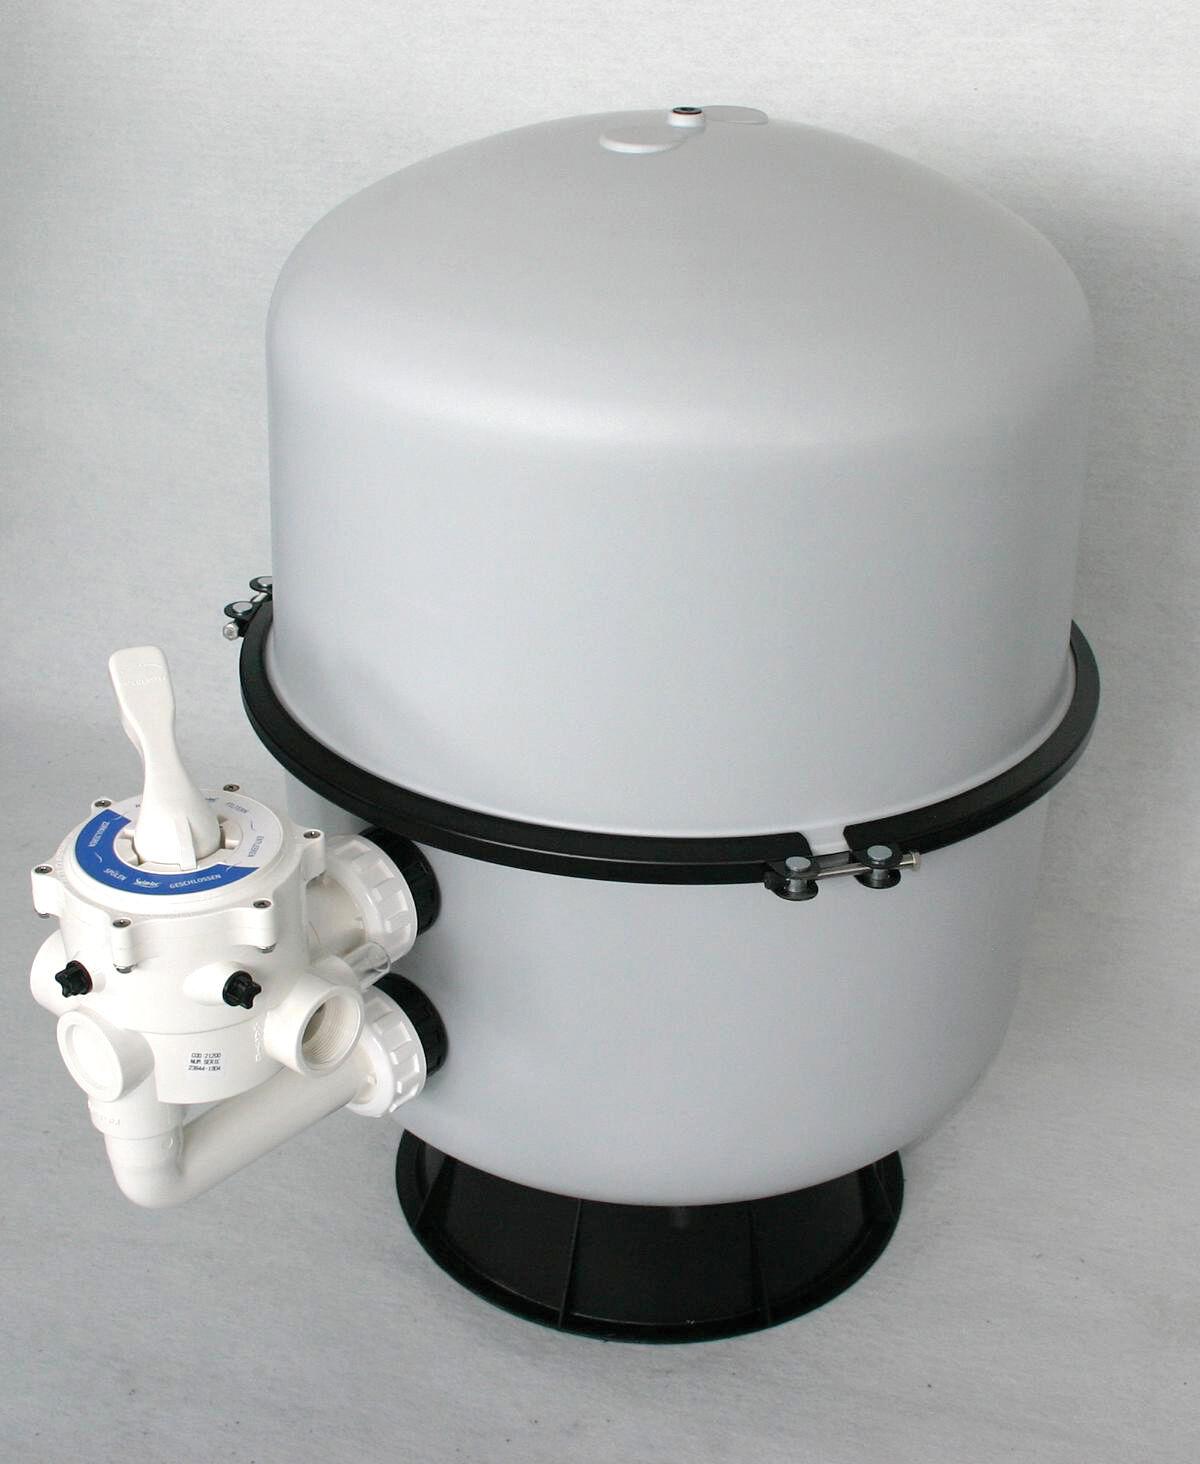 Sandfilter Filterbehälter Bilbao 350 6-Wege-Ventil Poolfilter Teichfilter